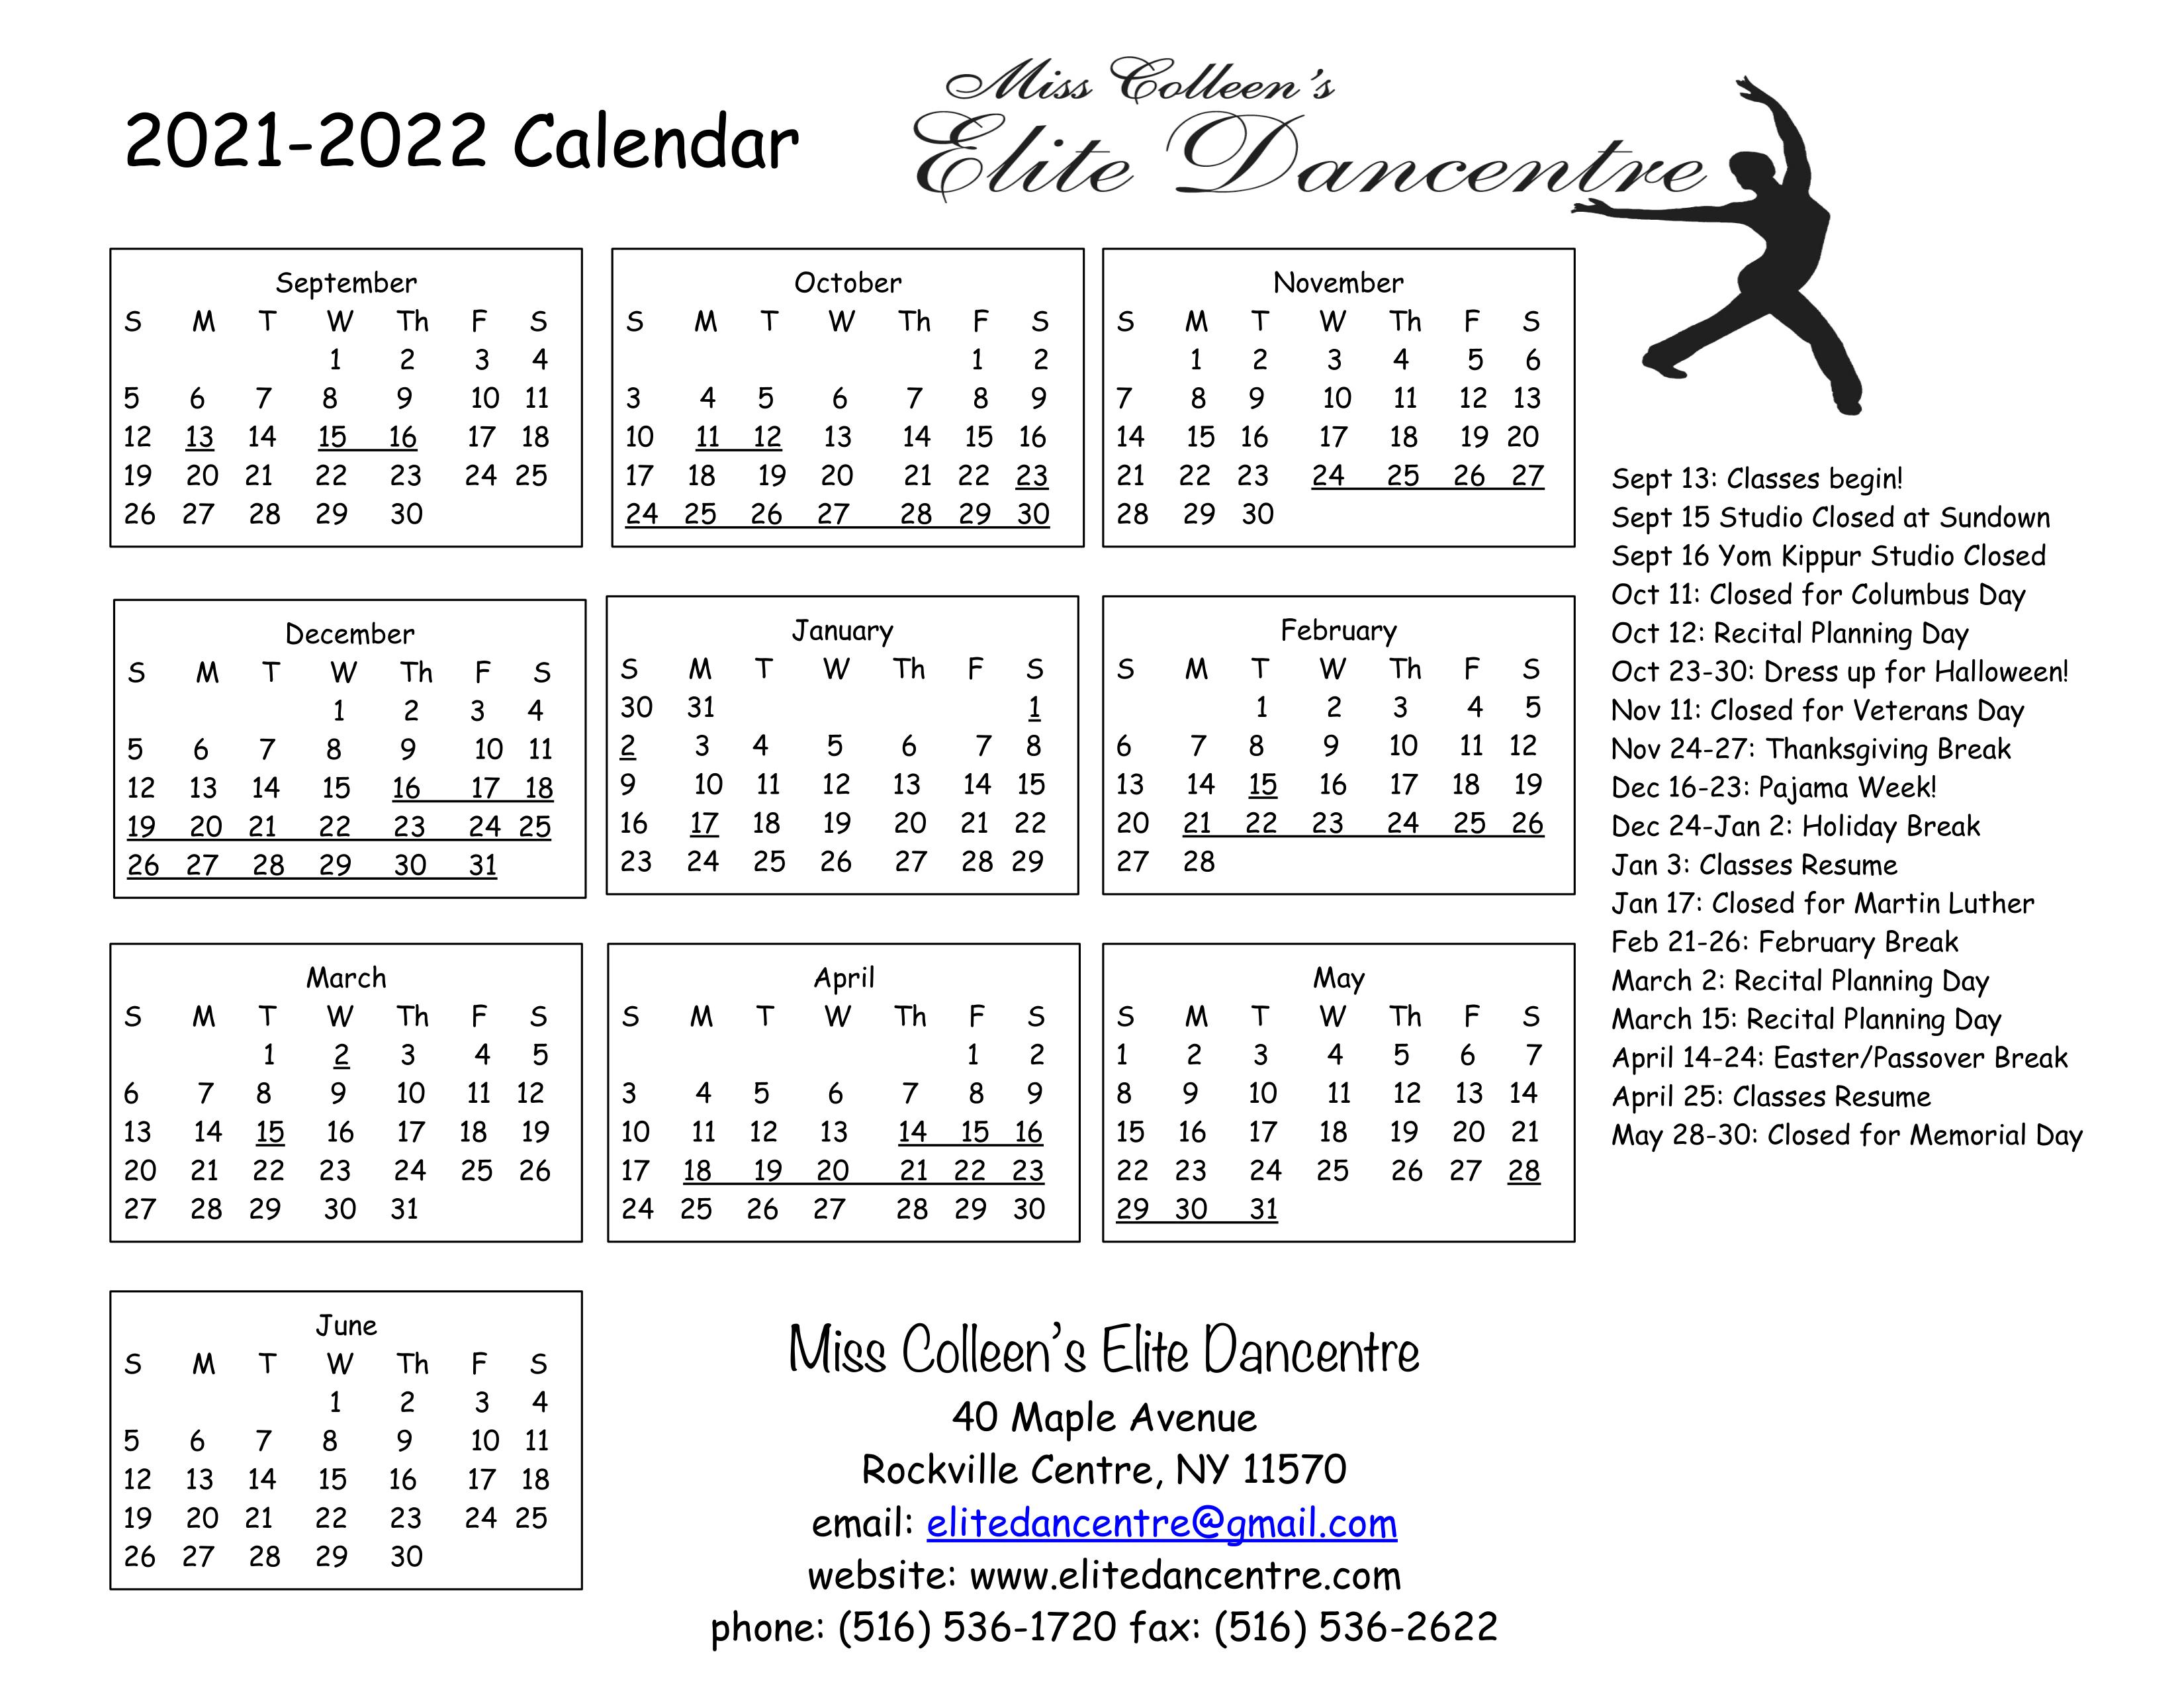 edc calendar 2021.png